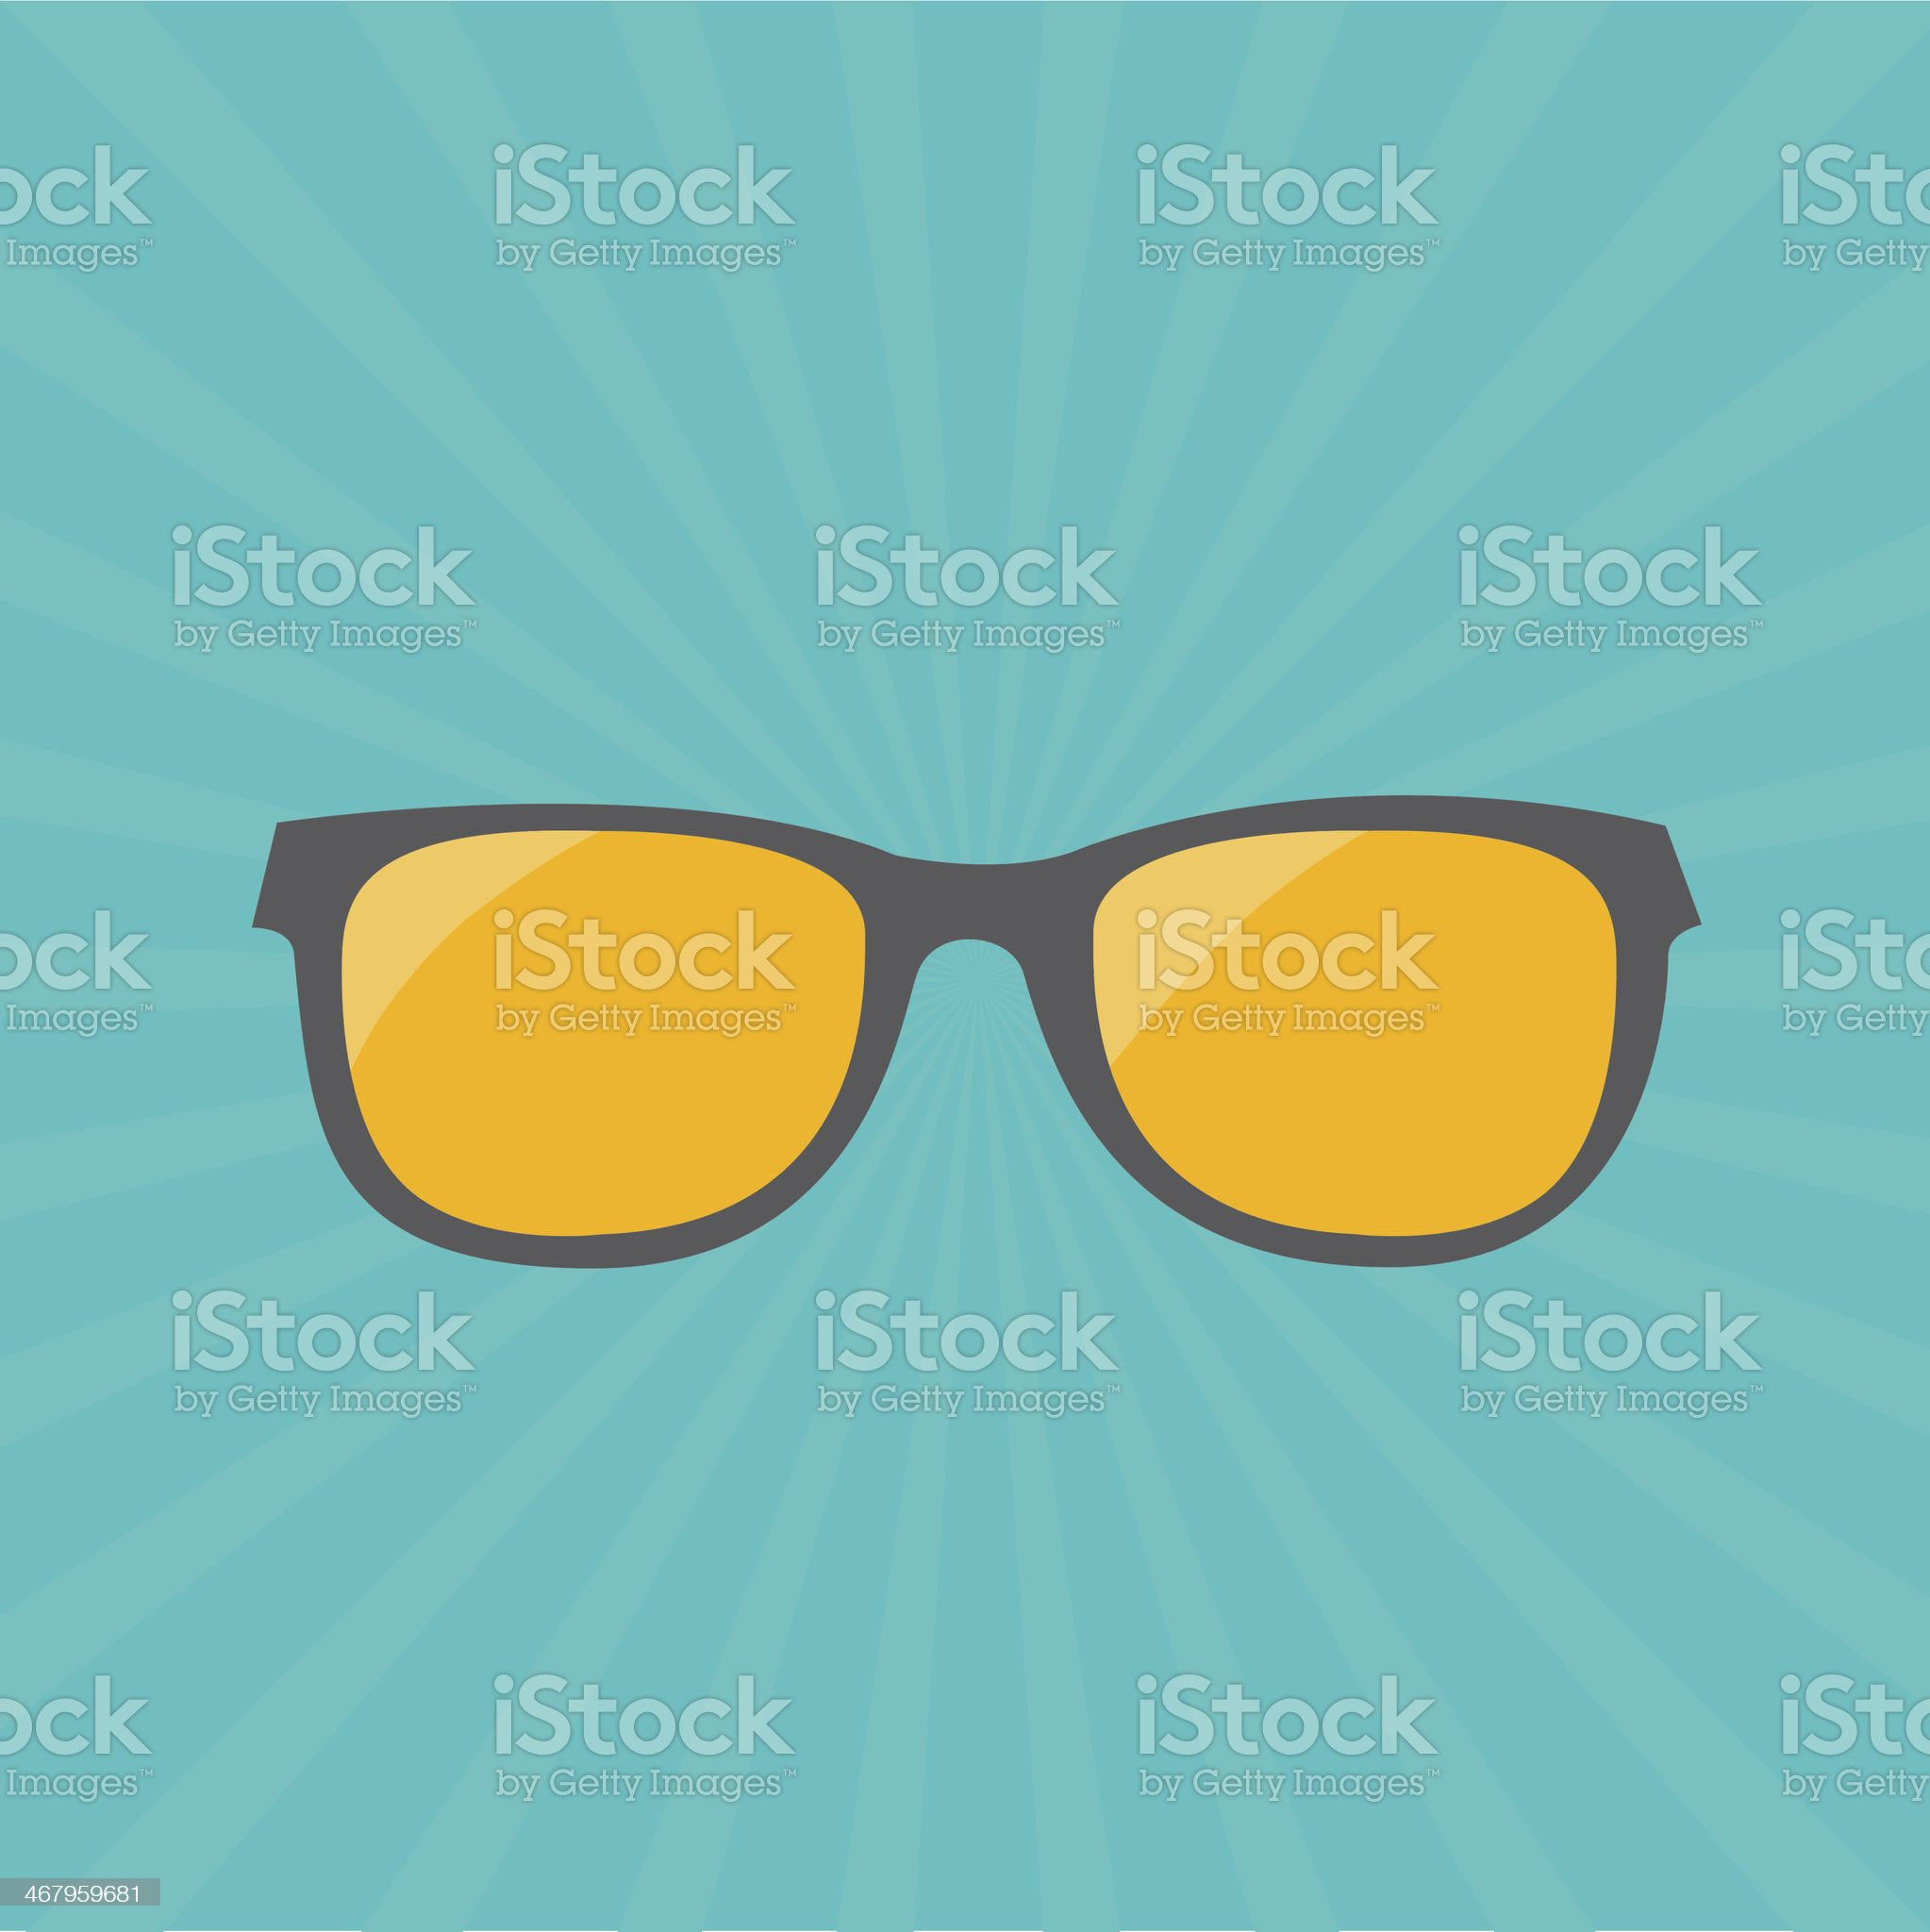 Glasses with yellow lens. Sunburst background. royalty-free stock vector art